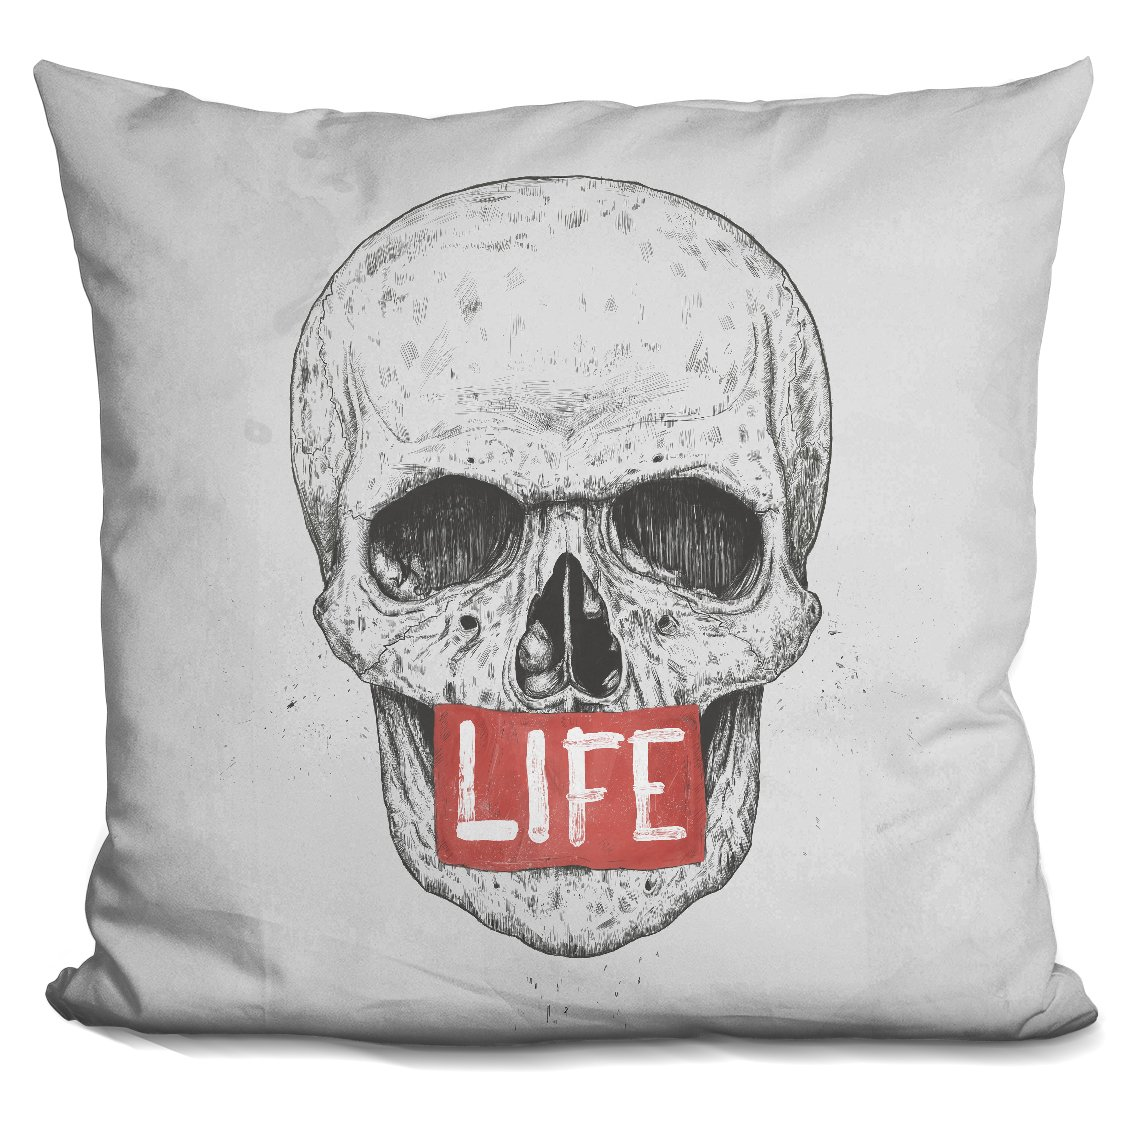 LiLiPi Life Decorative Accent Throw Pillow